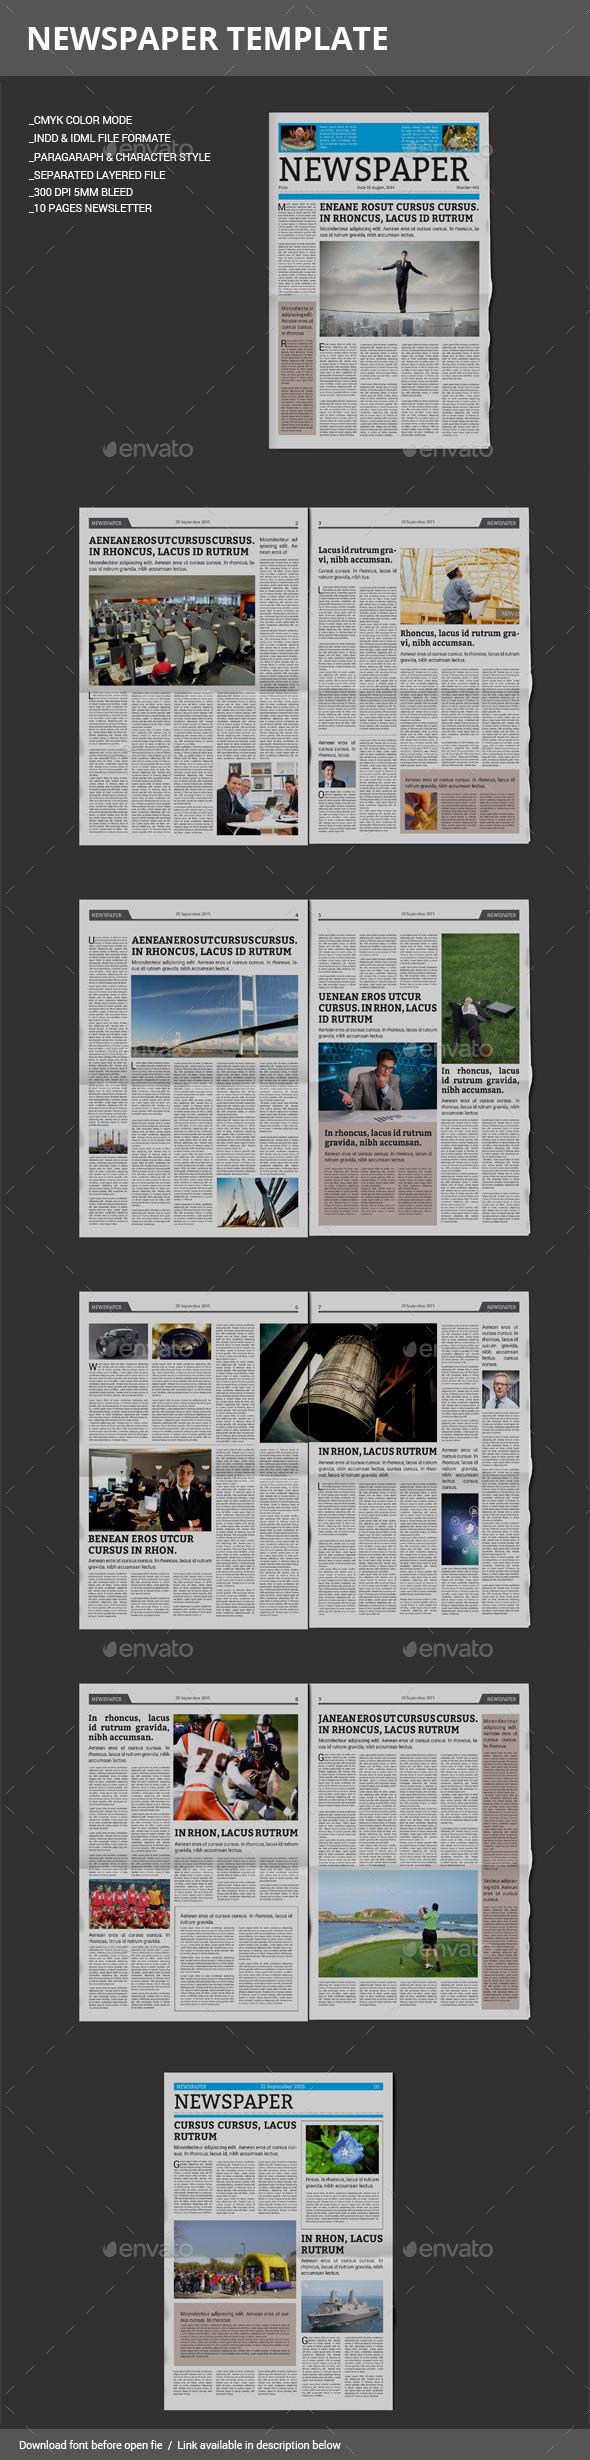 GraphicRiver Newspaper Template 8953179